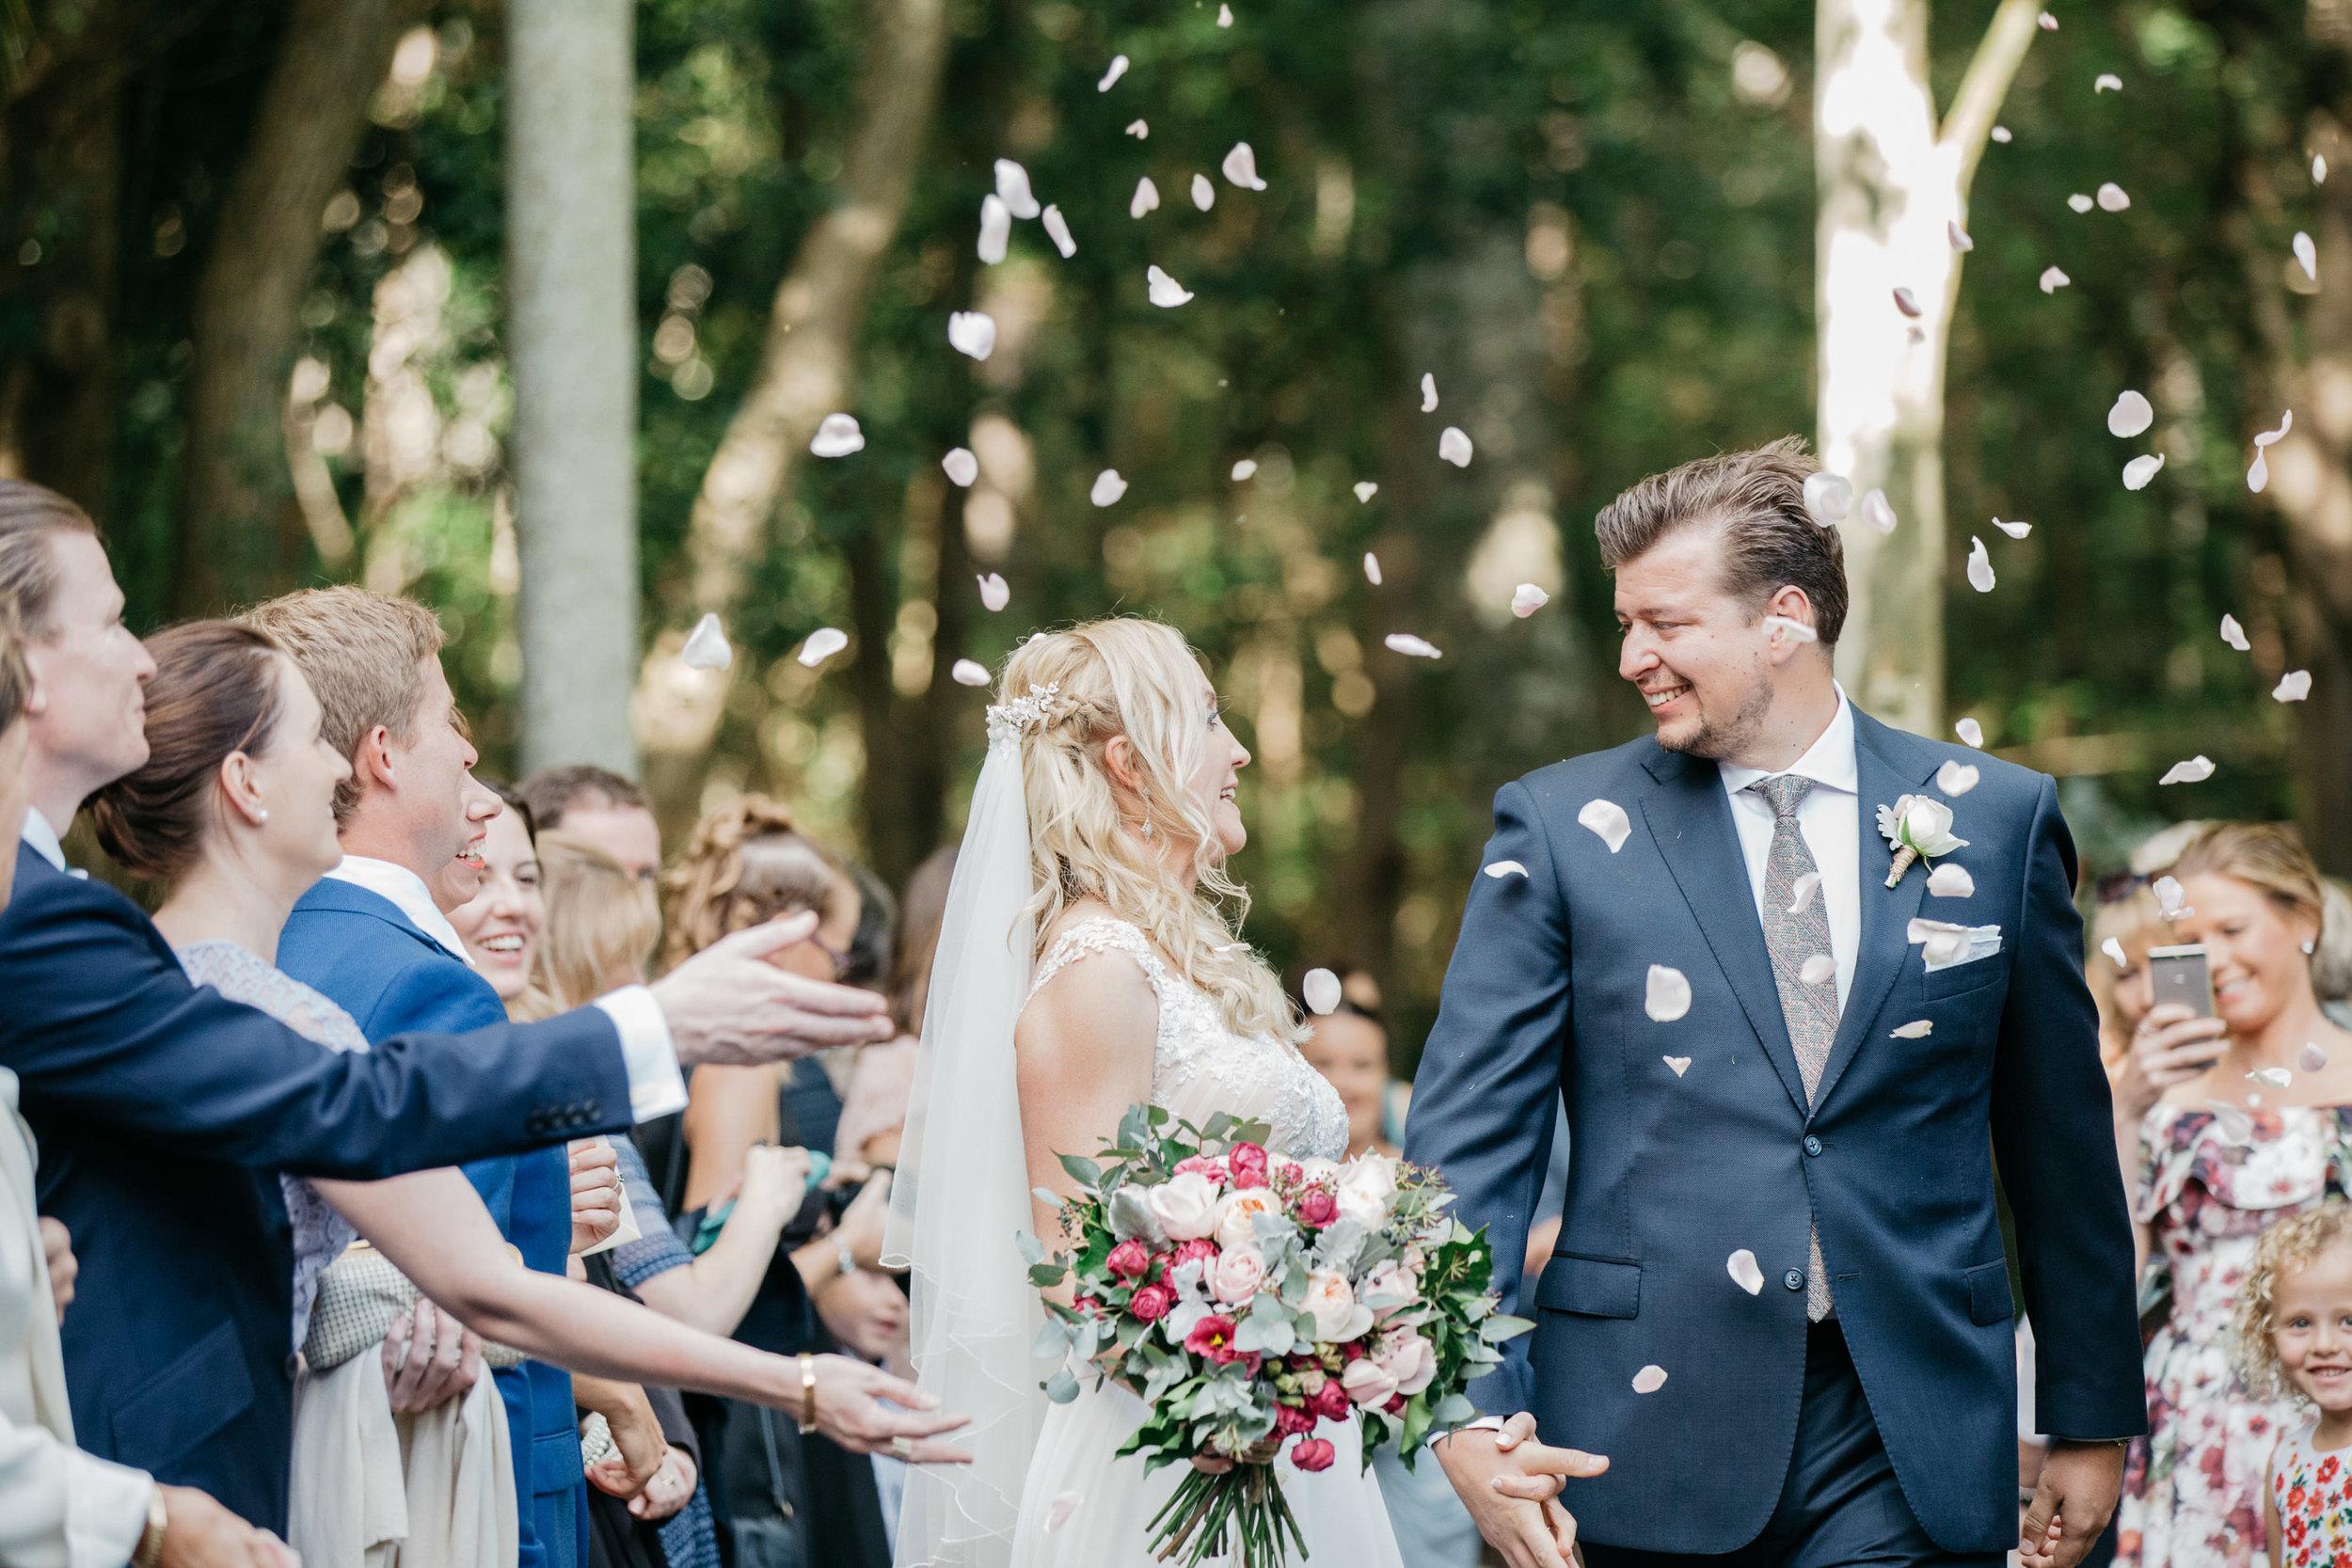 True North Photography_Boomerang Farm_Stacey and Isaac_Gold Coast Wedding_Barm Wedding_Hinterland Wedding-113.jpg